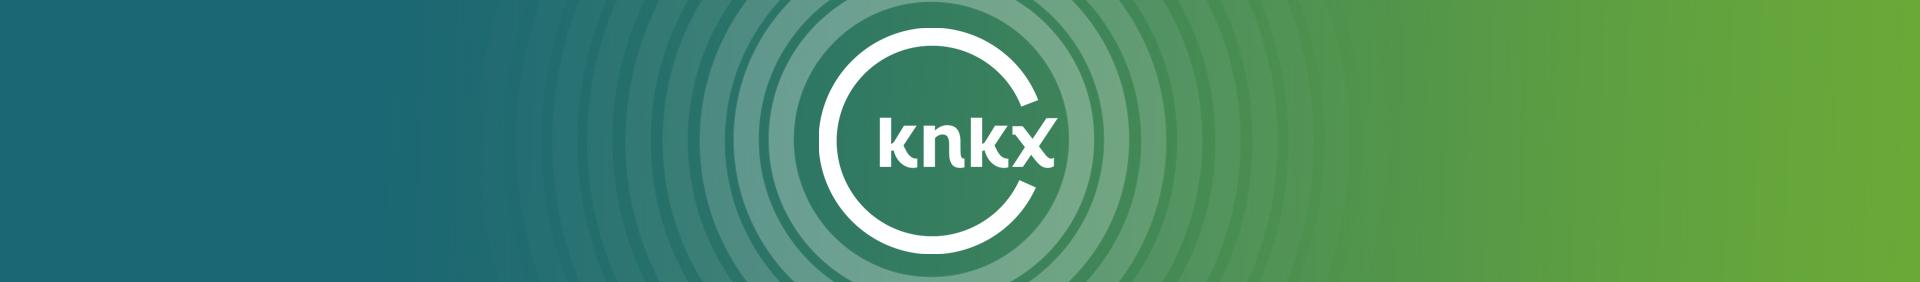 KNKX Logo | Seattle Digital Marketing Agency | CMA